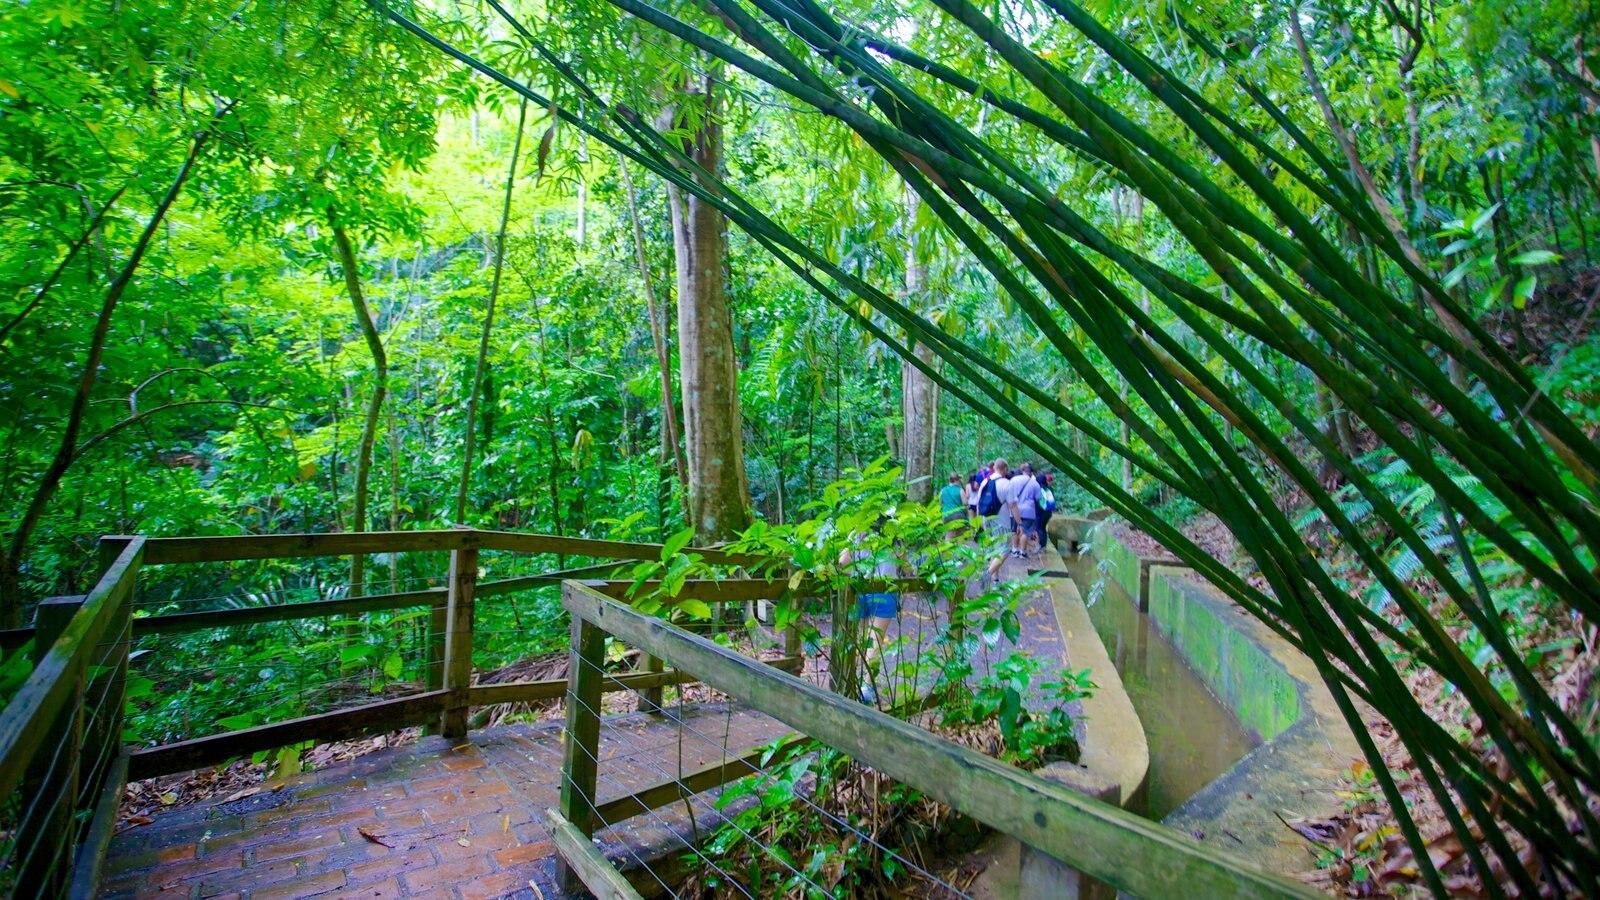 Hacienda Buena Vista featuring hiking or walking and rainforest